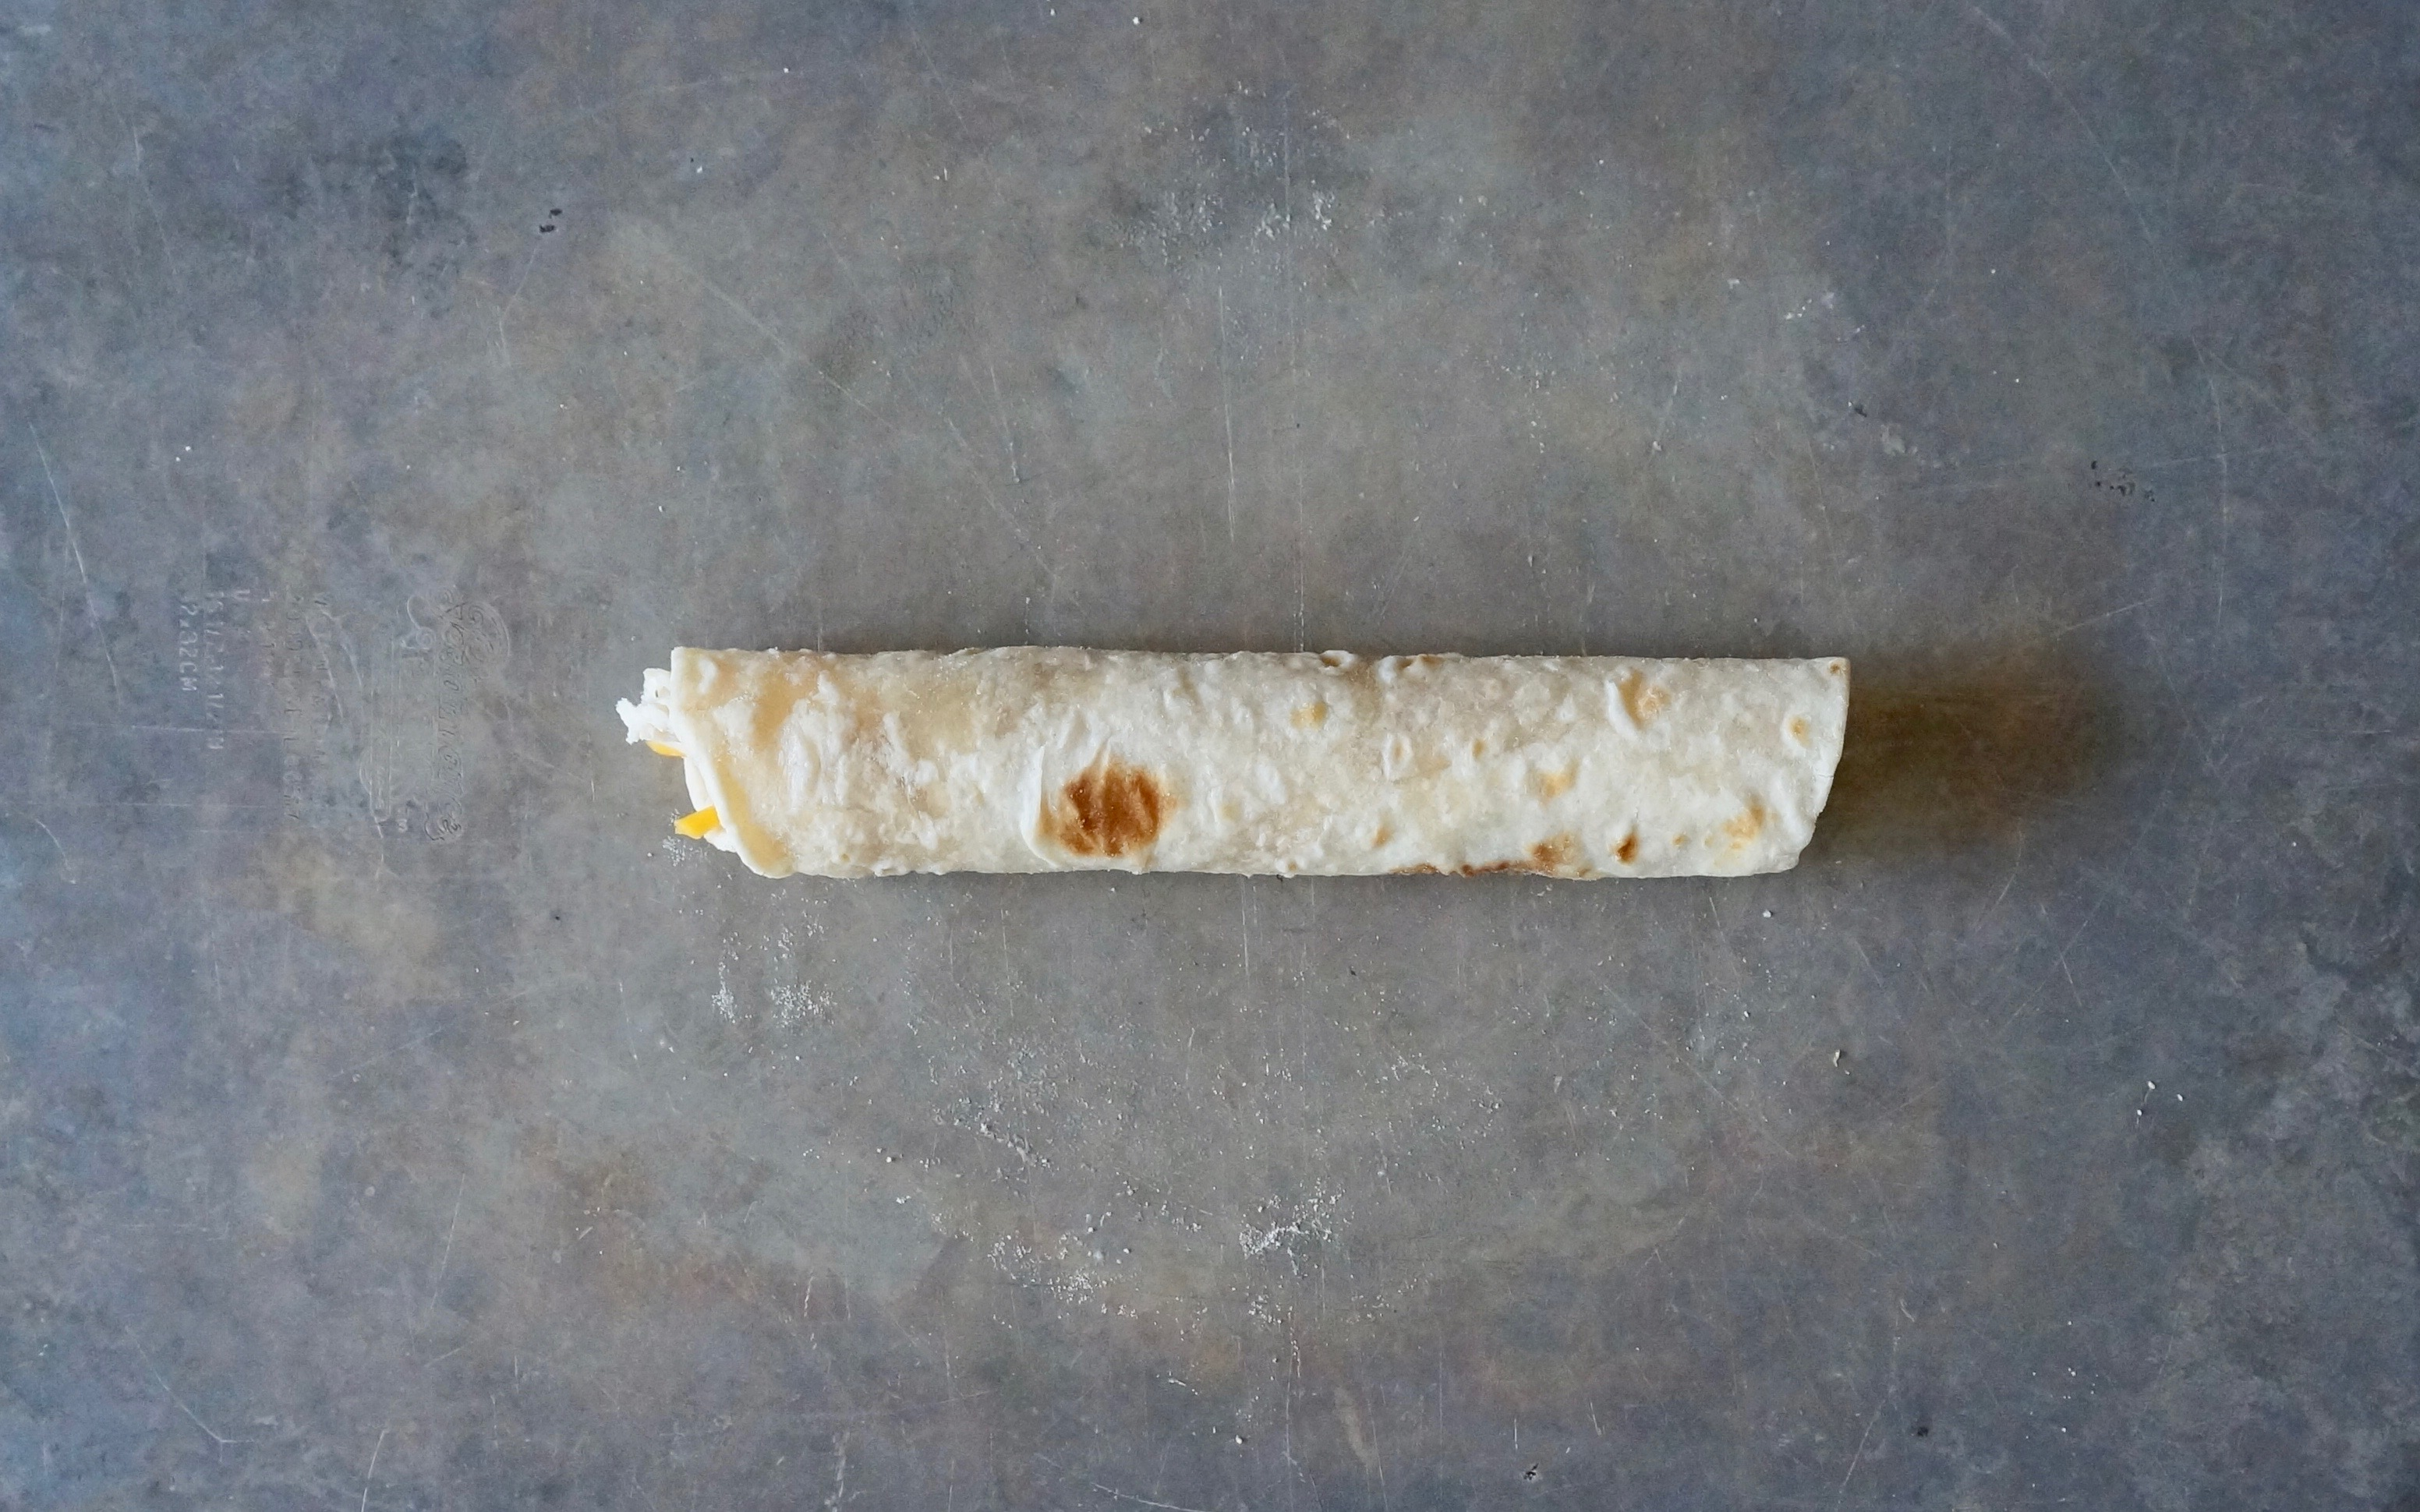 How-Do-You-Make-Flautas-Grilled-Chicken-Flautas-Rebecca-Gordon-Publisher-Buttermilk-Lipstick-Cooking-Class-Southern-Hostess-Entertaining-RebeccaGordon-Pastry-Chef-Gardener-Birmingham-Alabama